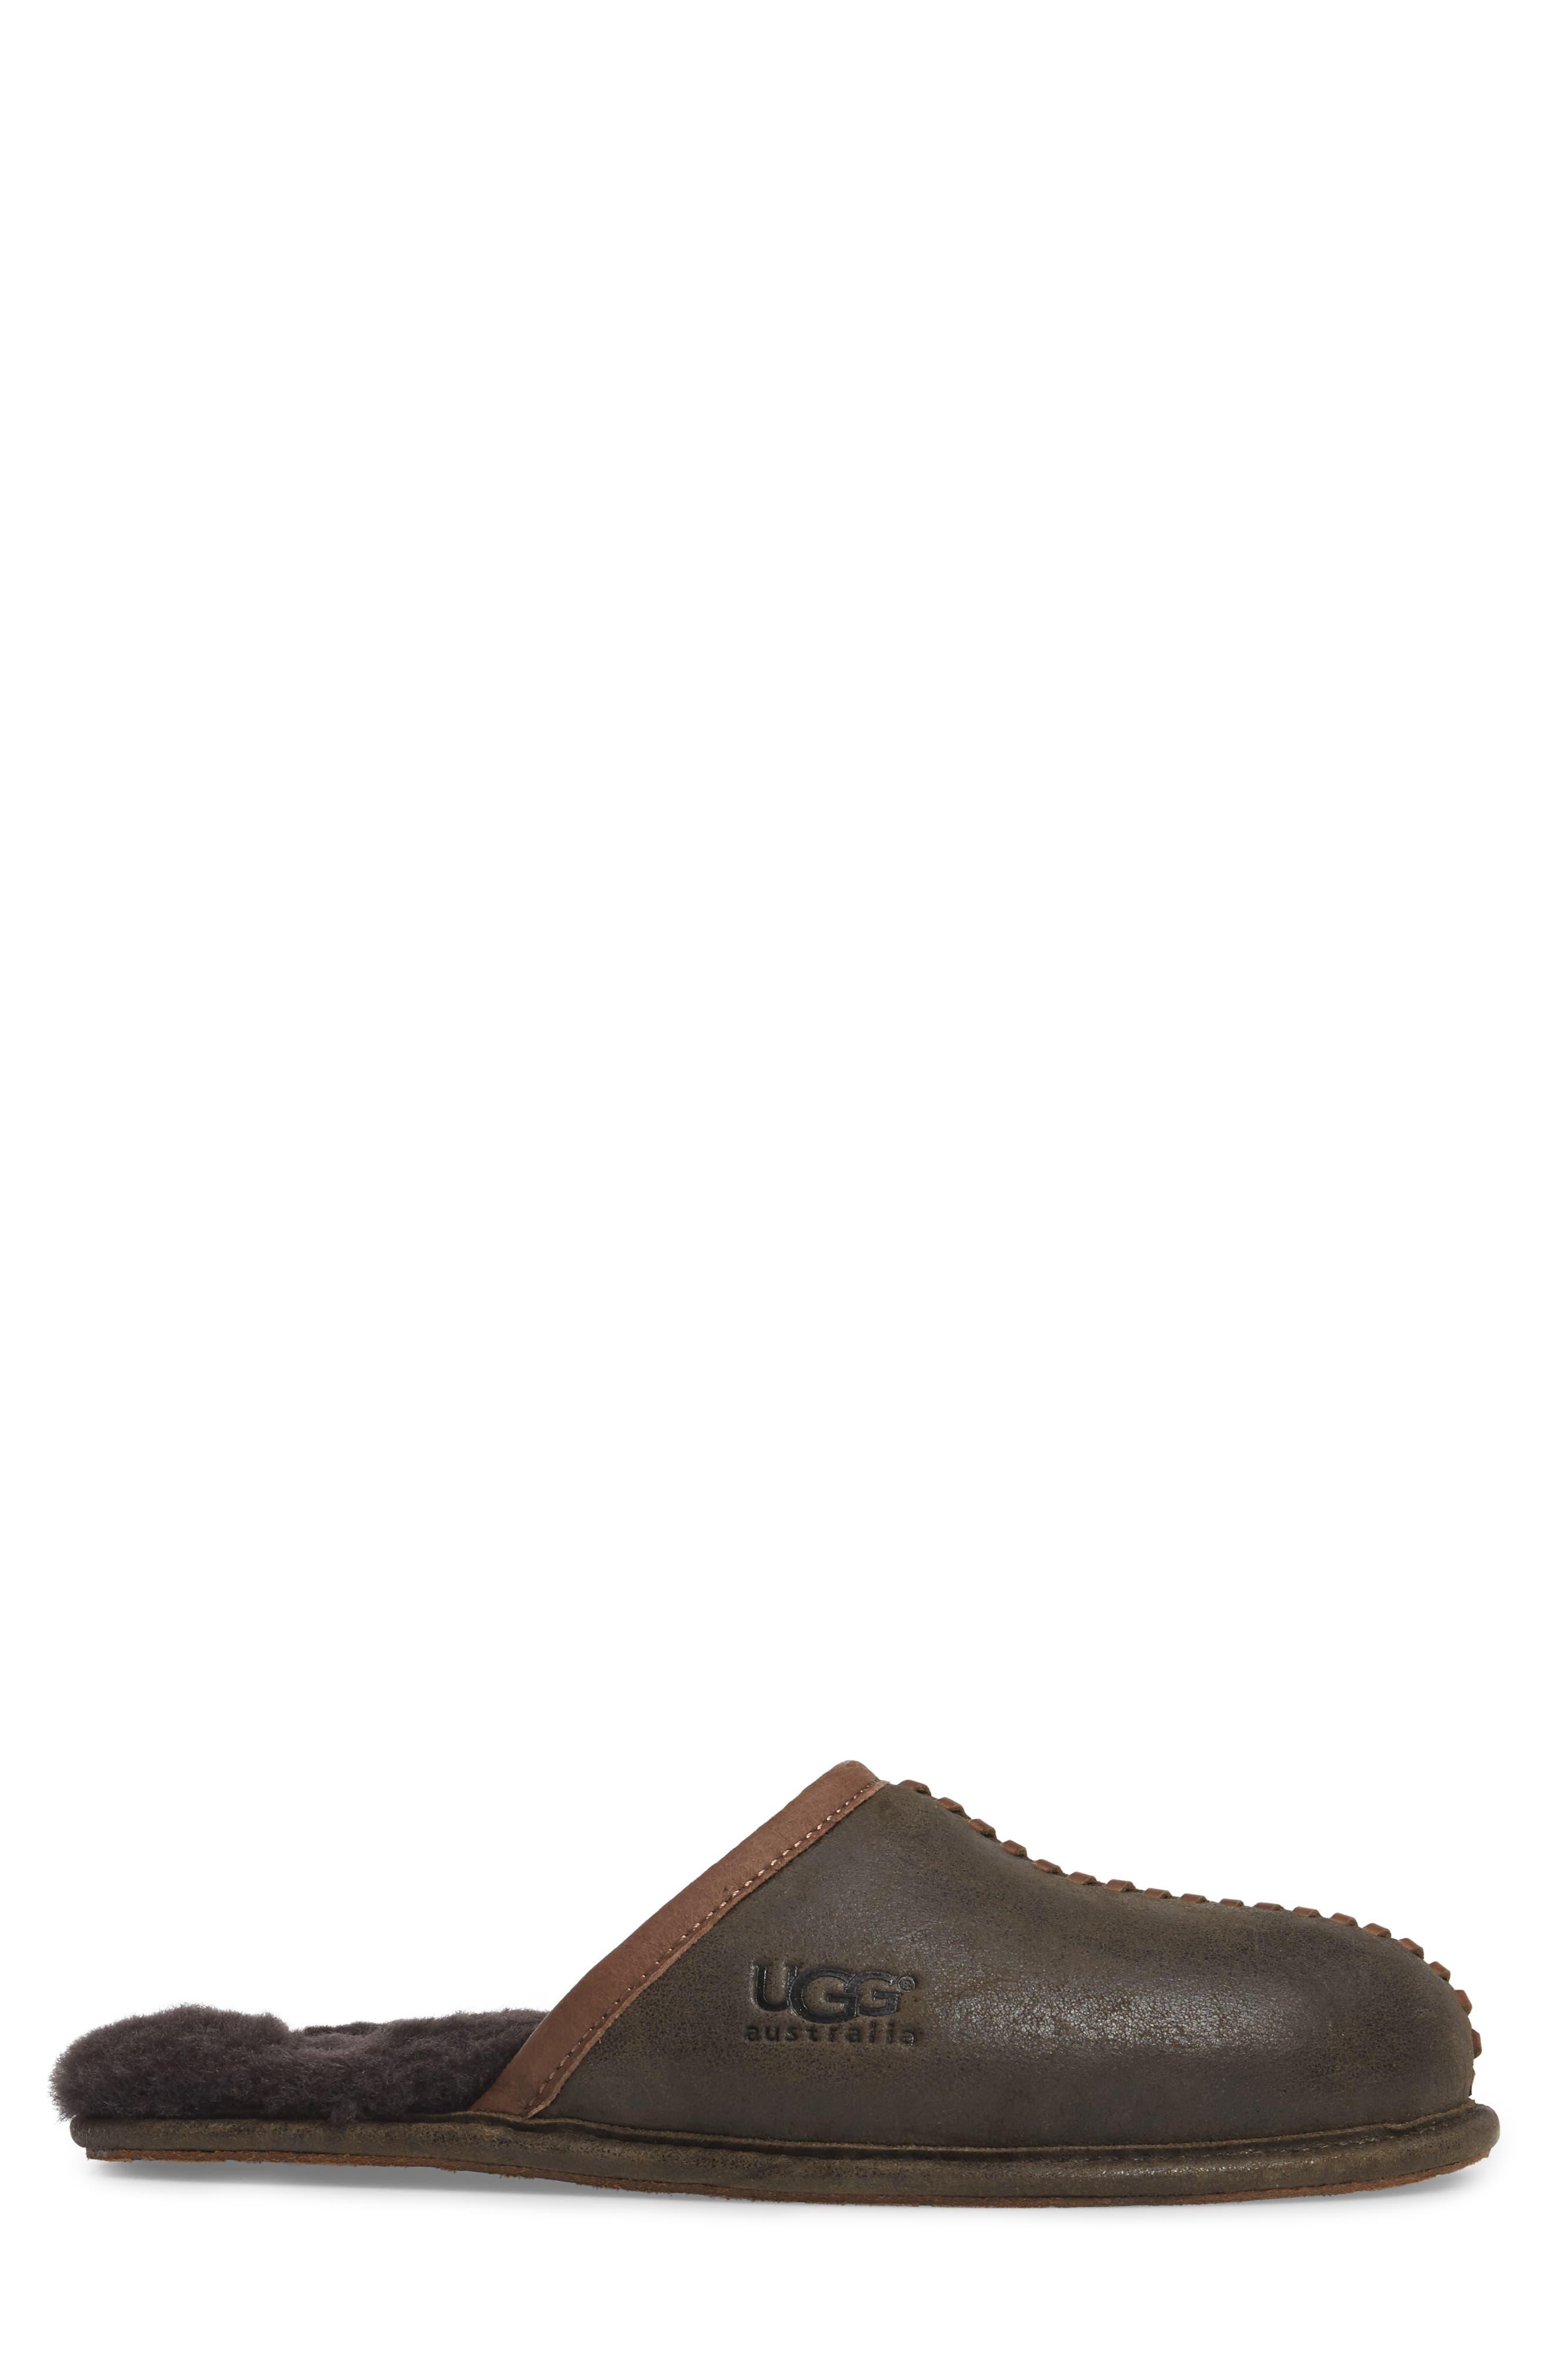 Alternate Image 3  - UGG® Scuff - Deco Genuine Shearling Slipper (Men)